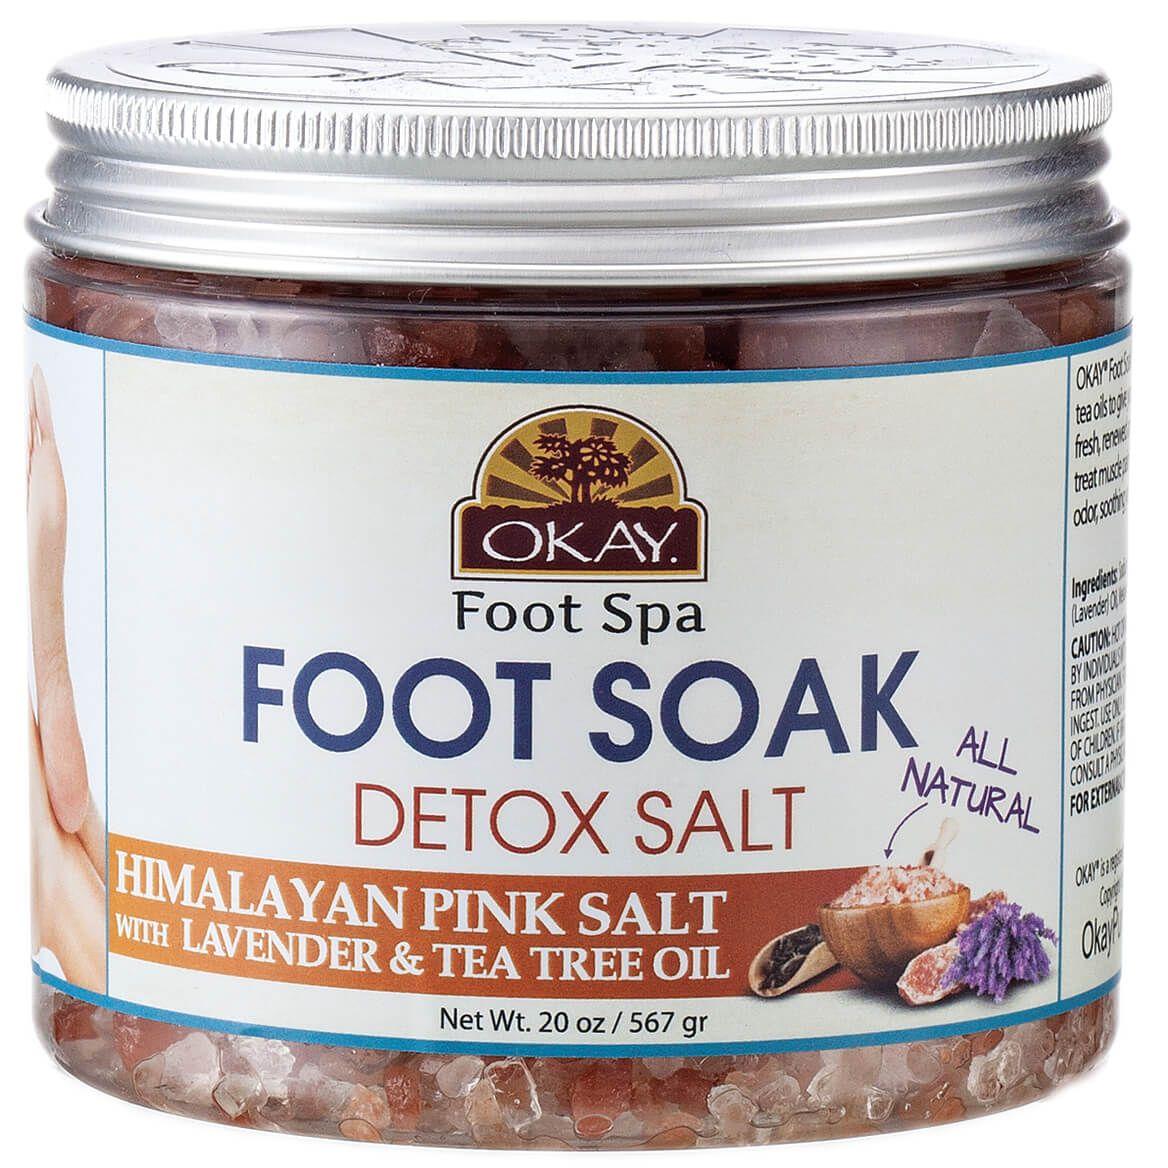 OKAY® Foot Soak Detox Salt – Himalayan Pink Salt with Lavender & Tea Tree Oil-368990